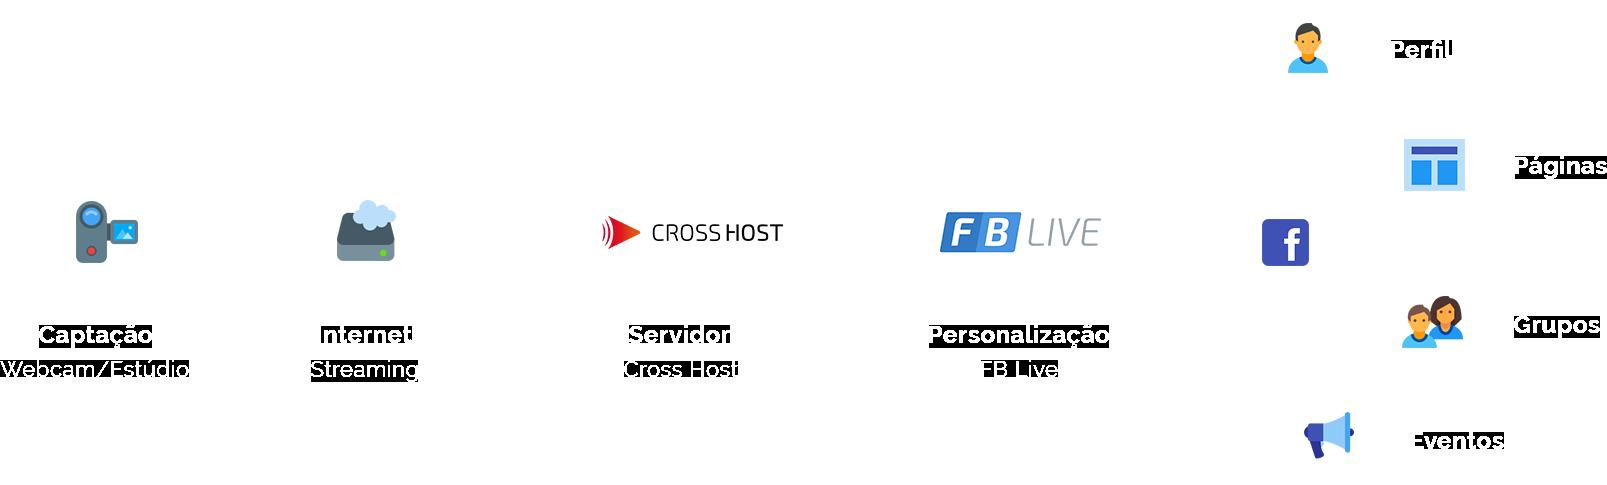 fb-live-fluxograma